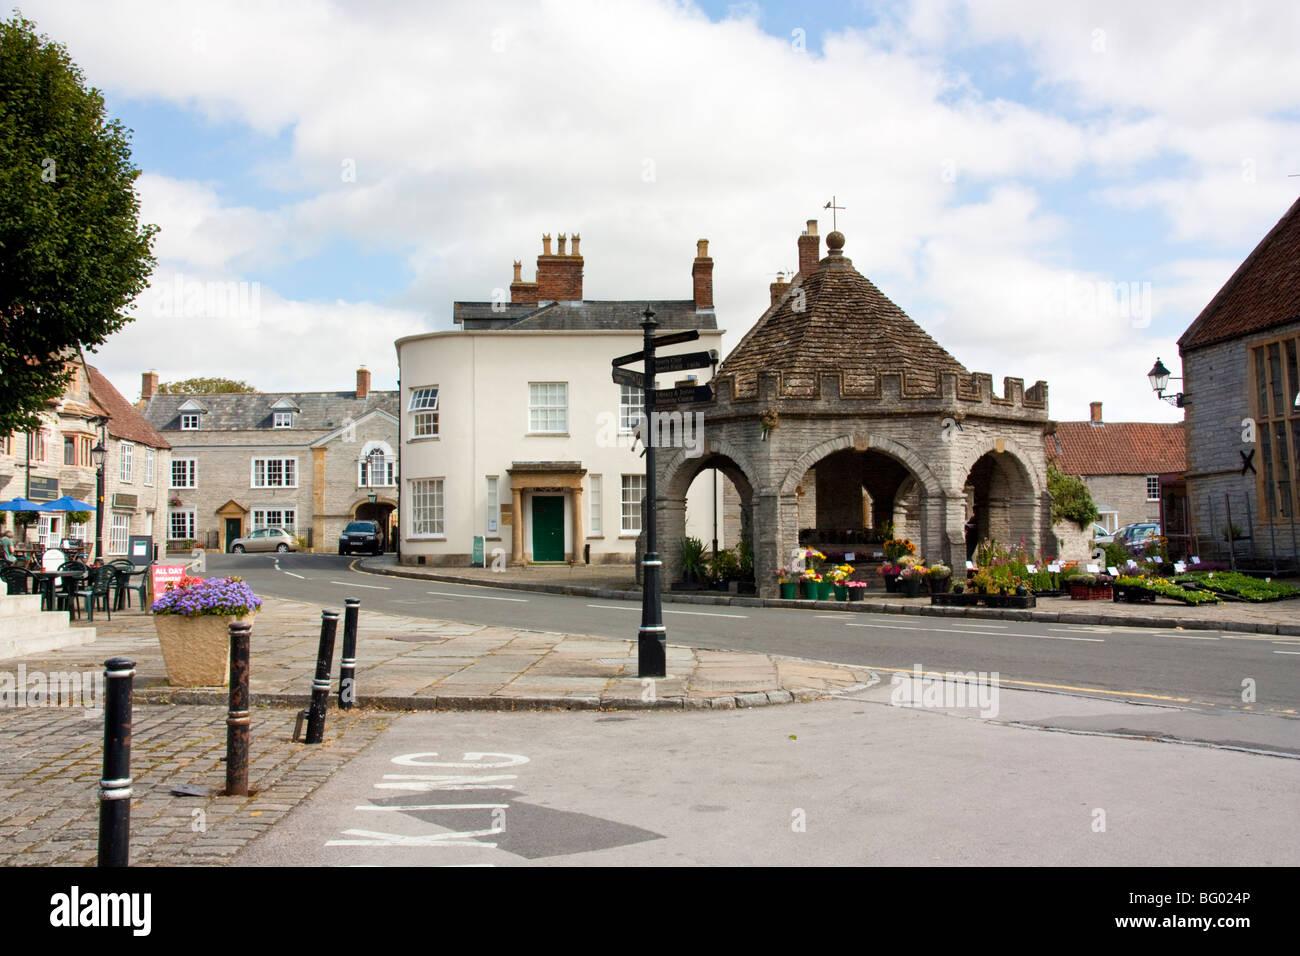 Street Scene, Somerton Somerset Engand - Stock Image